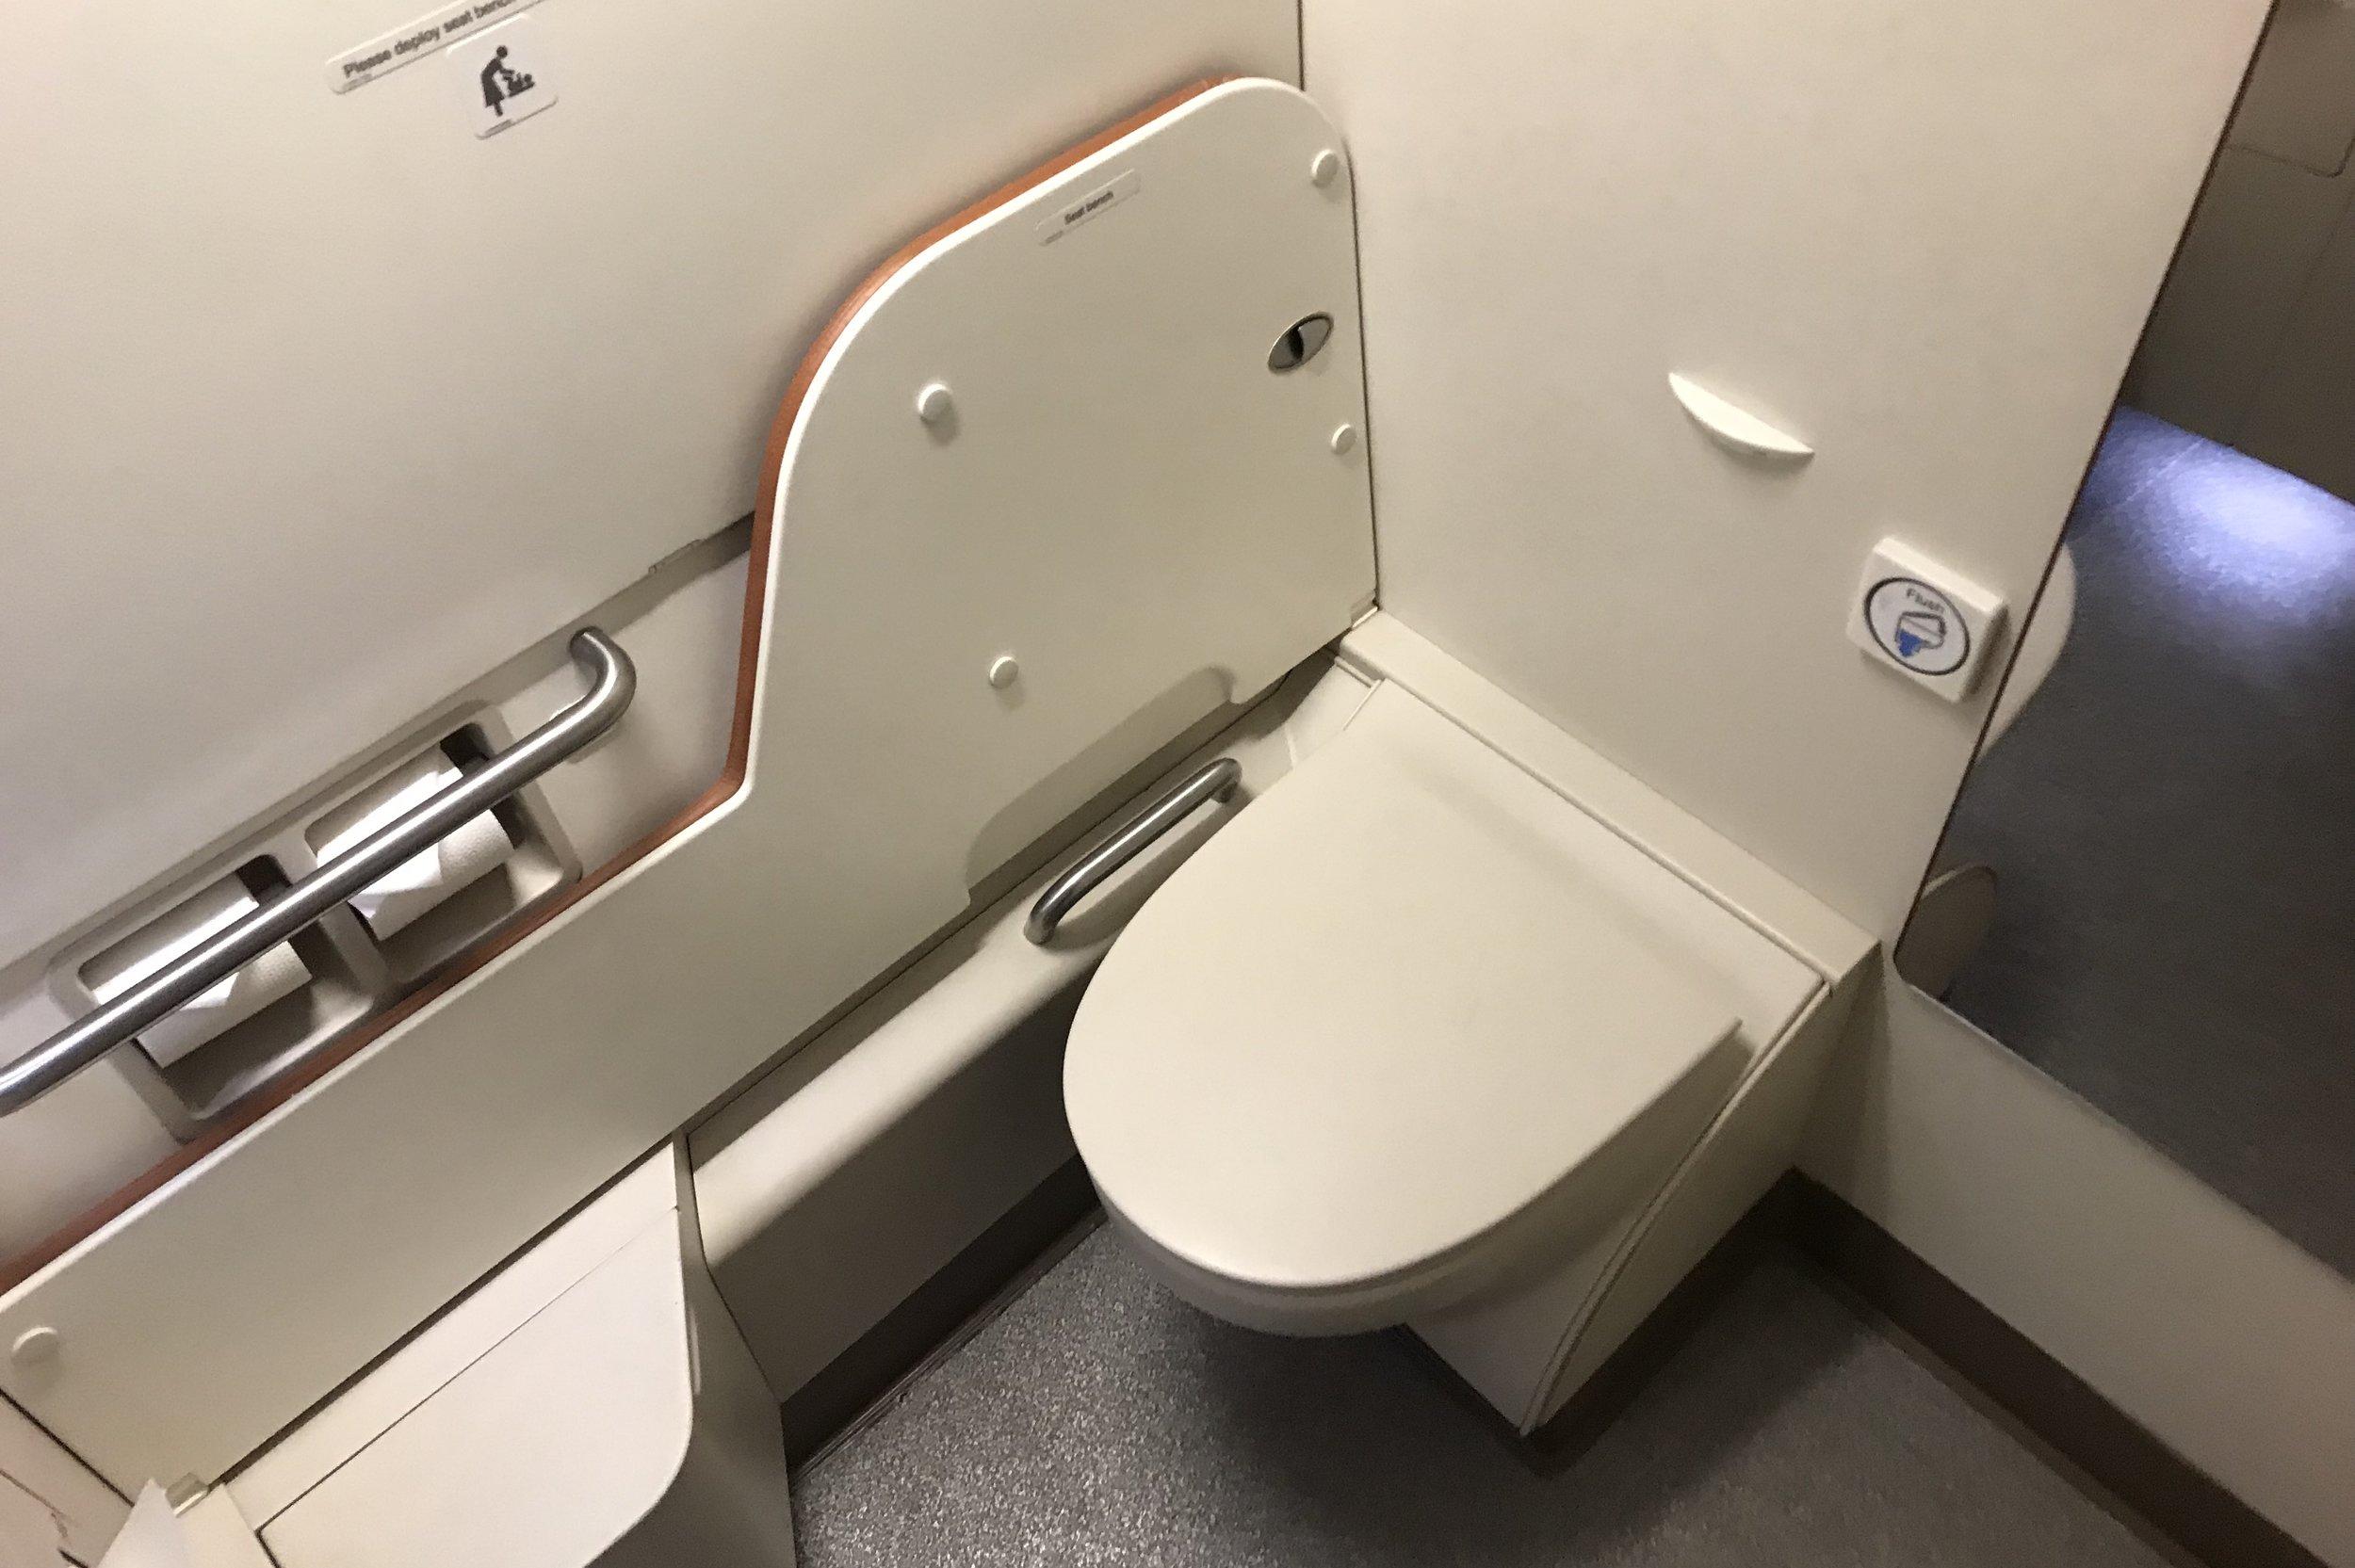 Singapore Airlines Suites Class – Restroom